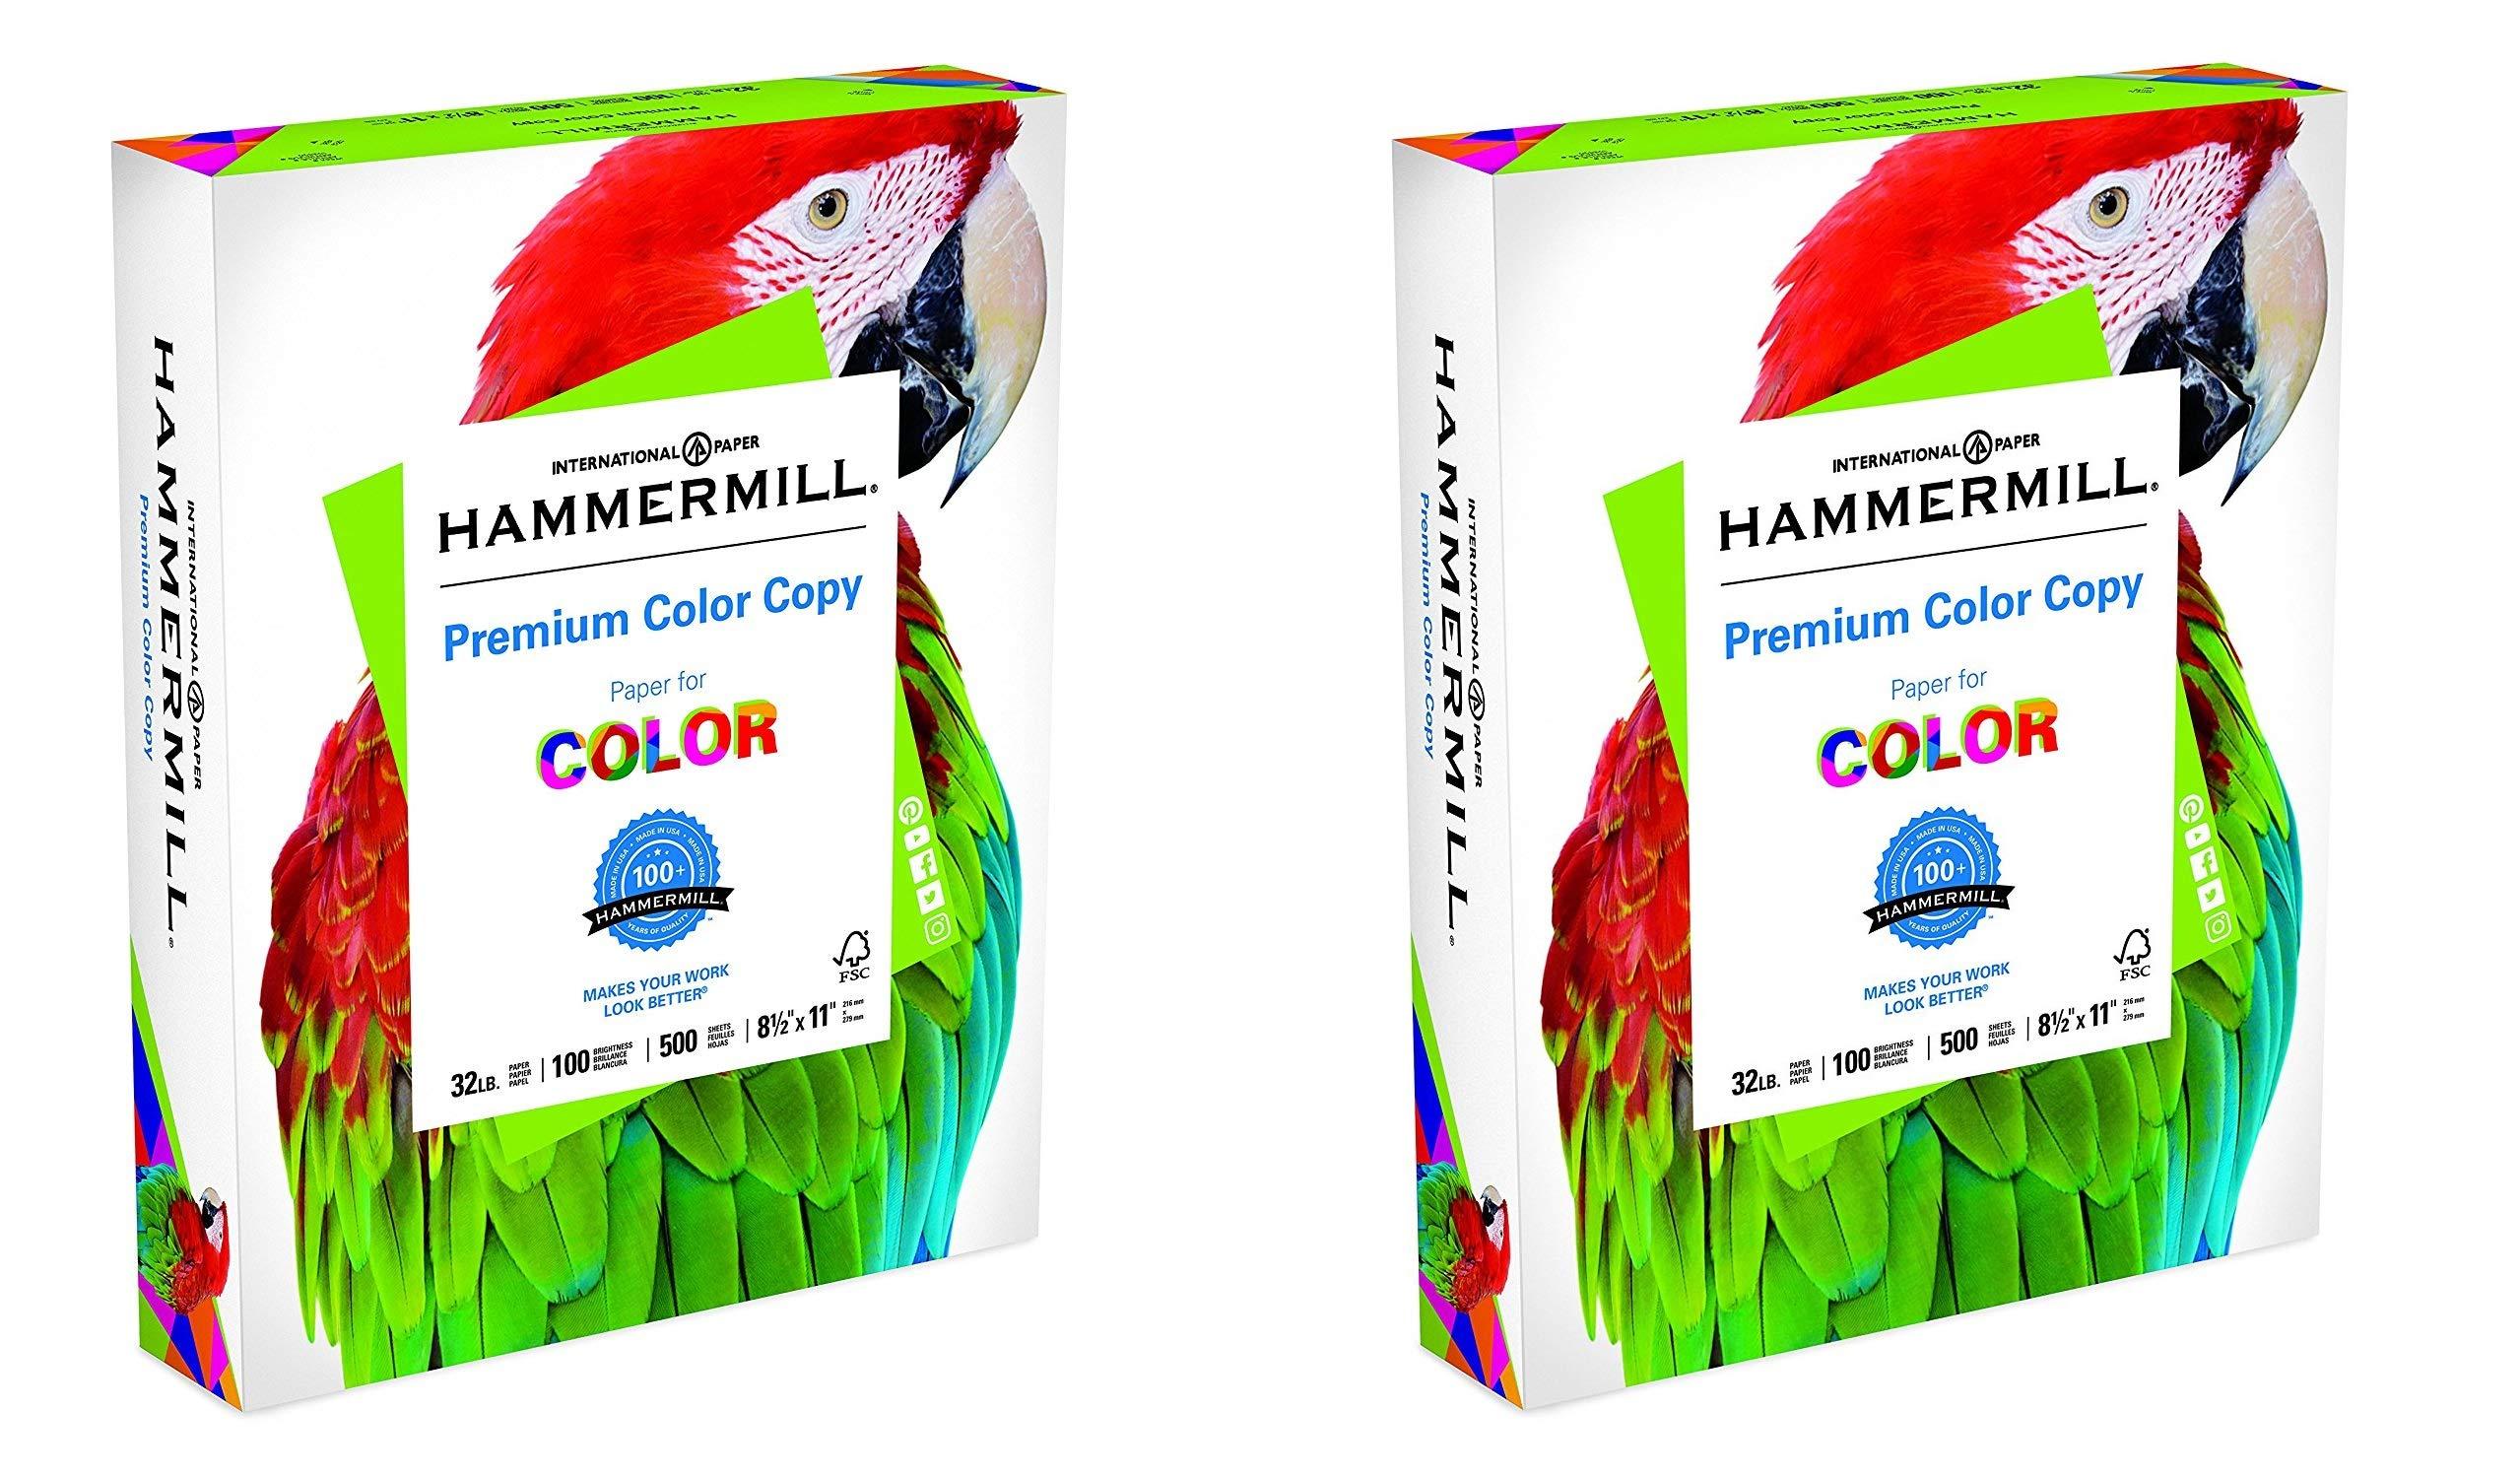 Hammermill Paper, Premium Color Copy, 32lb, 8.5 x 11, Letter, 100 Bright (2 X Pack of 500)